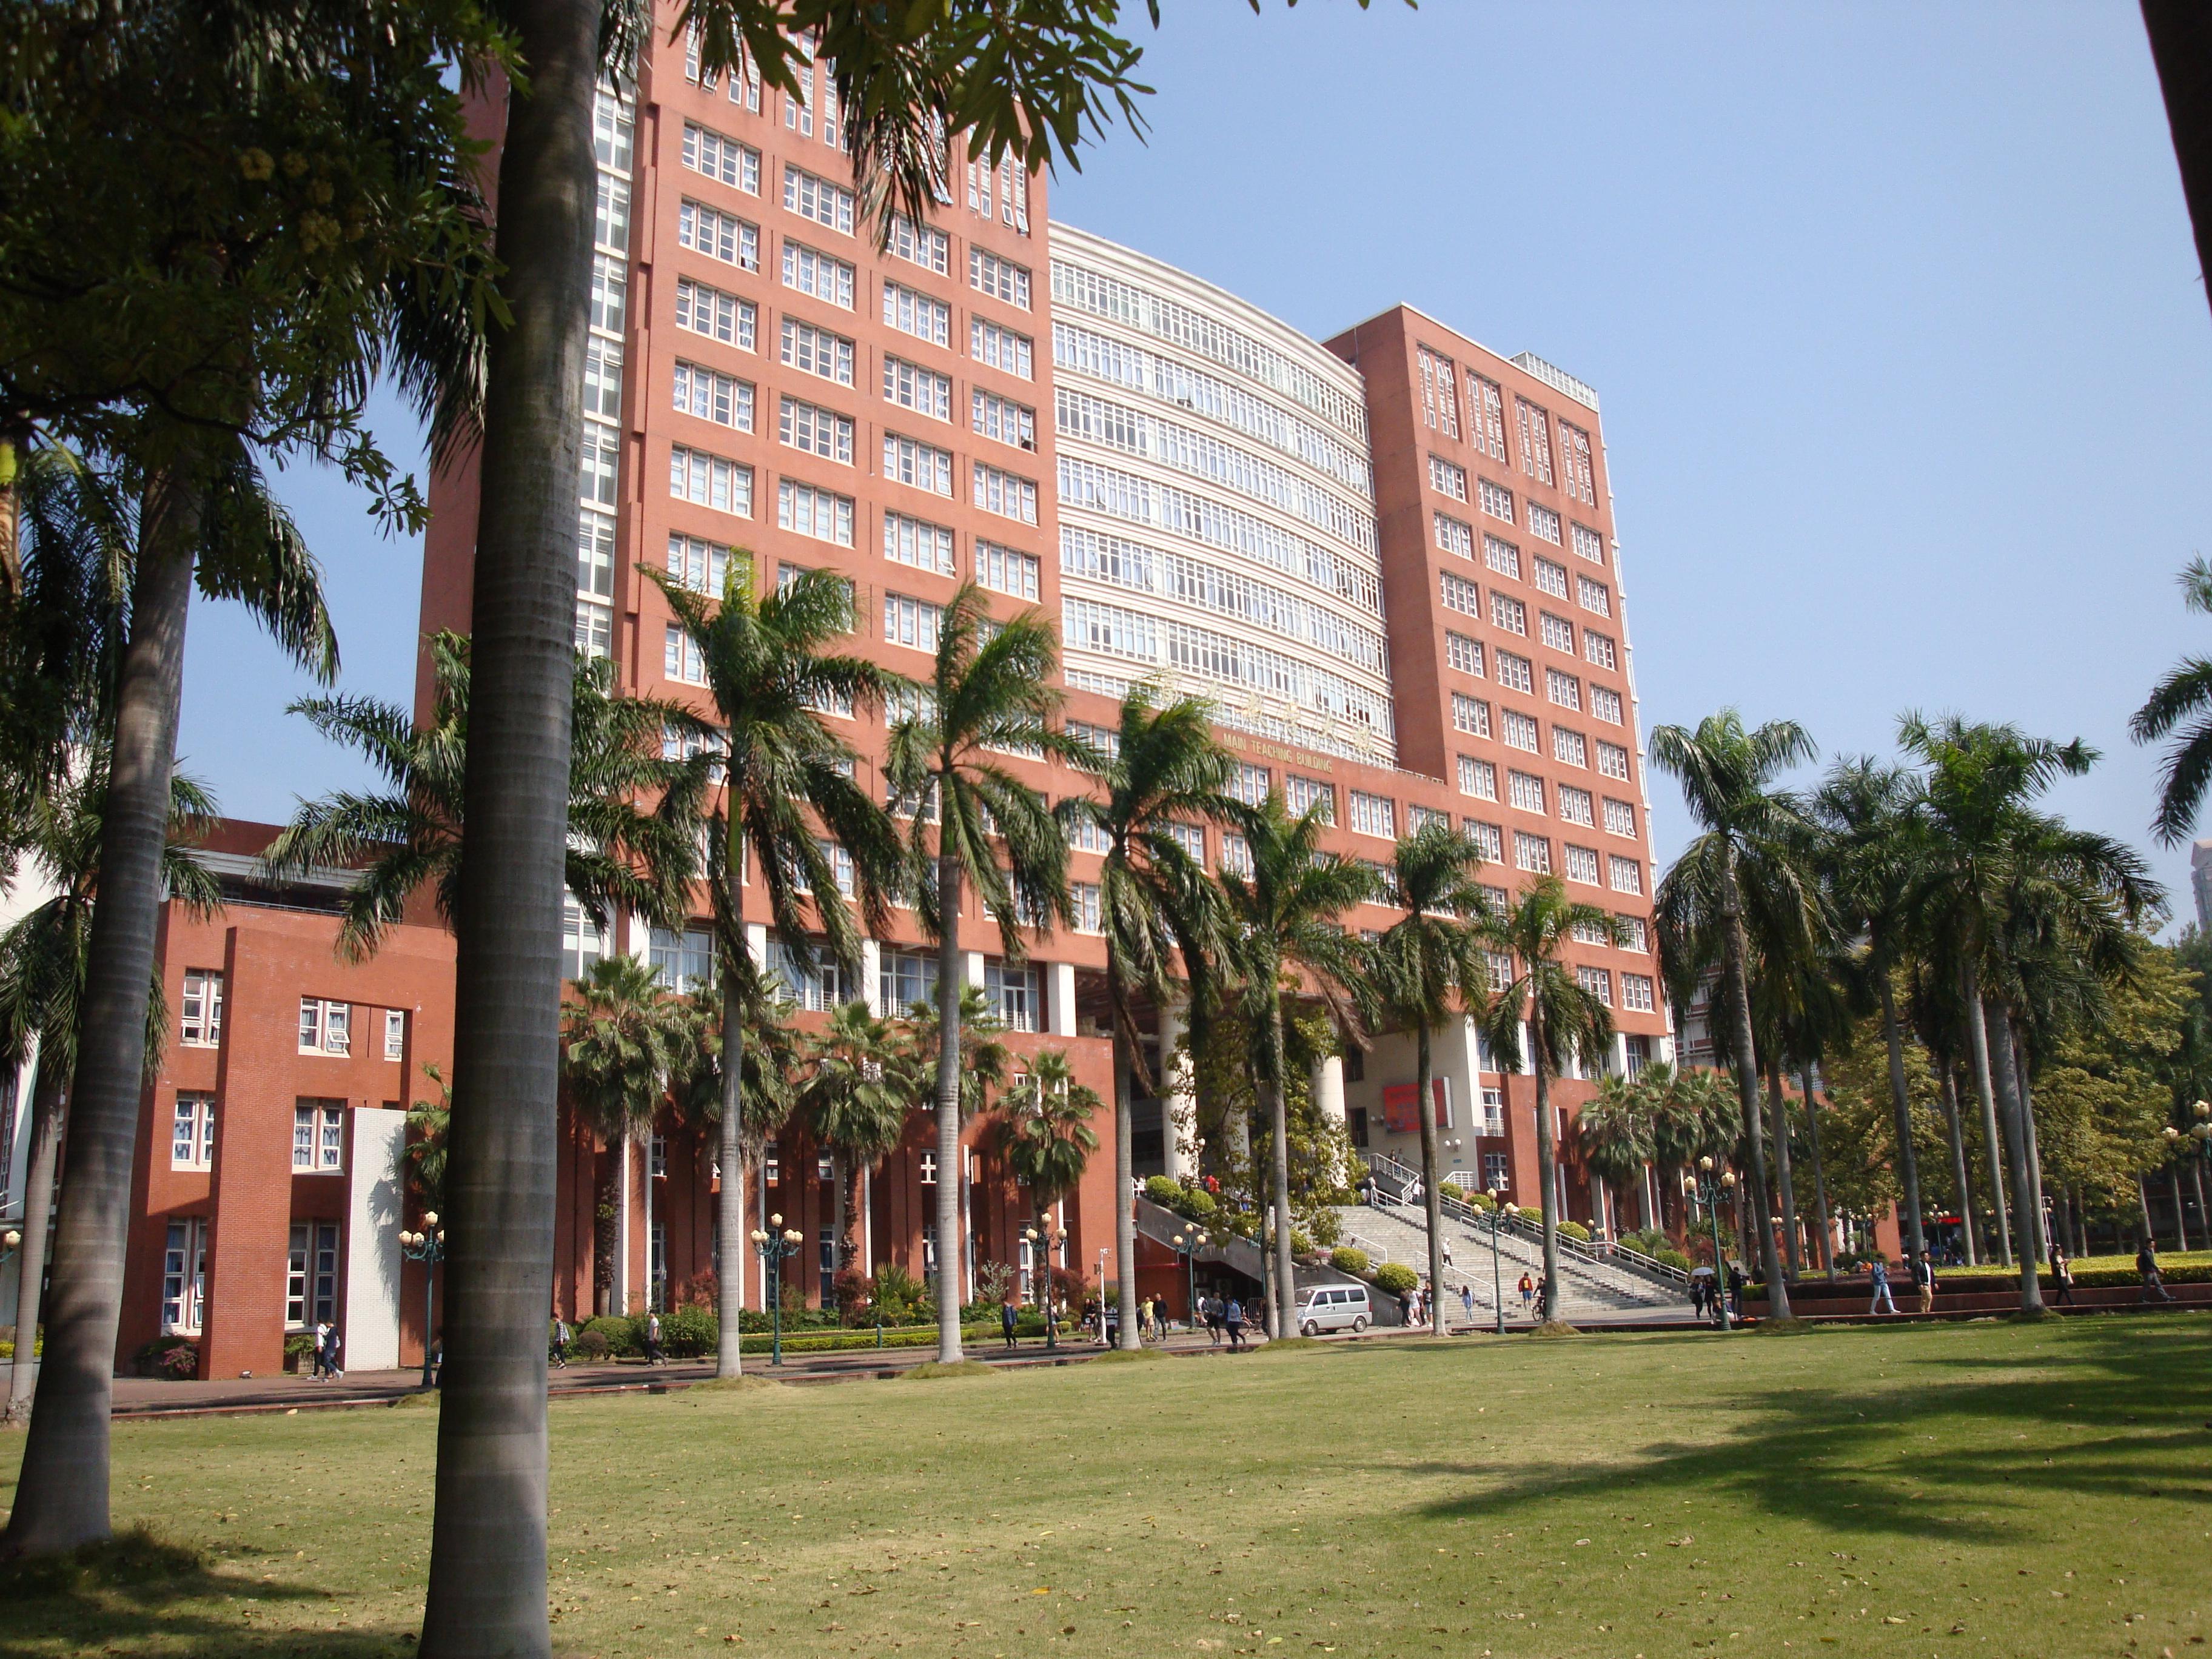 JNU teaching building